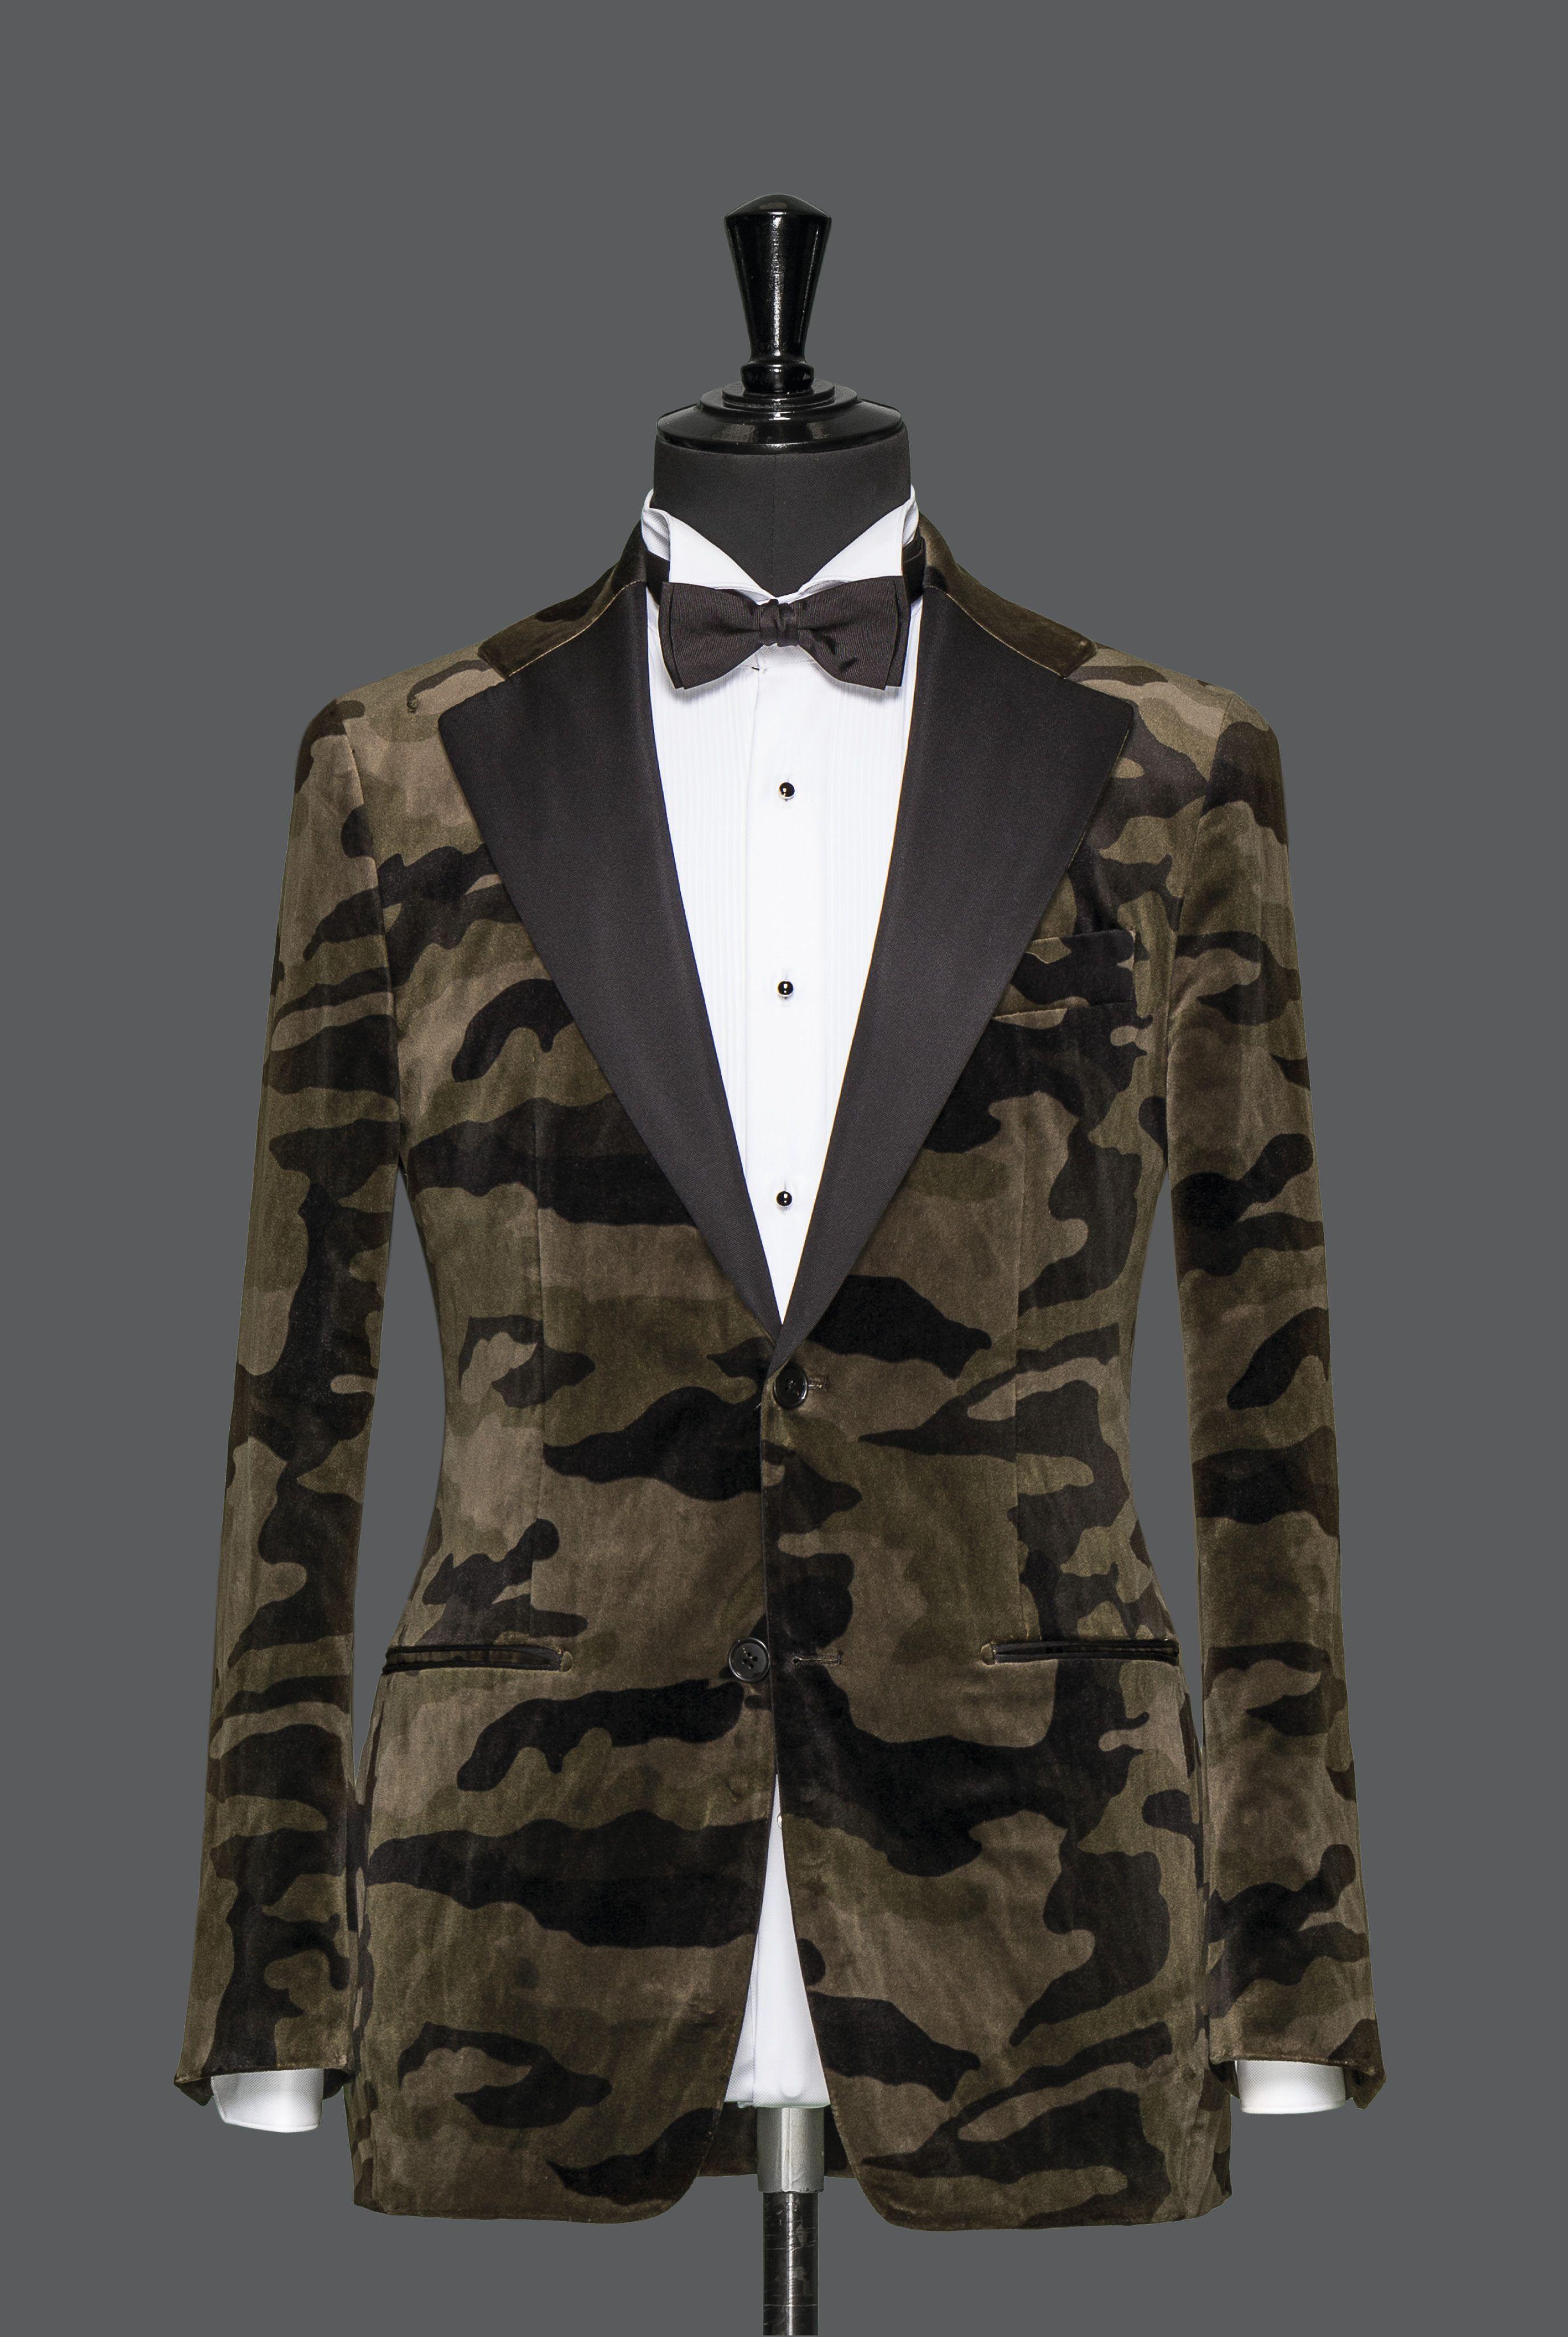 978e332970f00 Tailor Made, Velvet Camo Suit   17C   Camo suit, Suits, Camo tuxedo